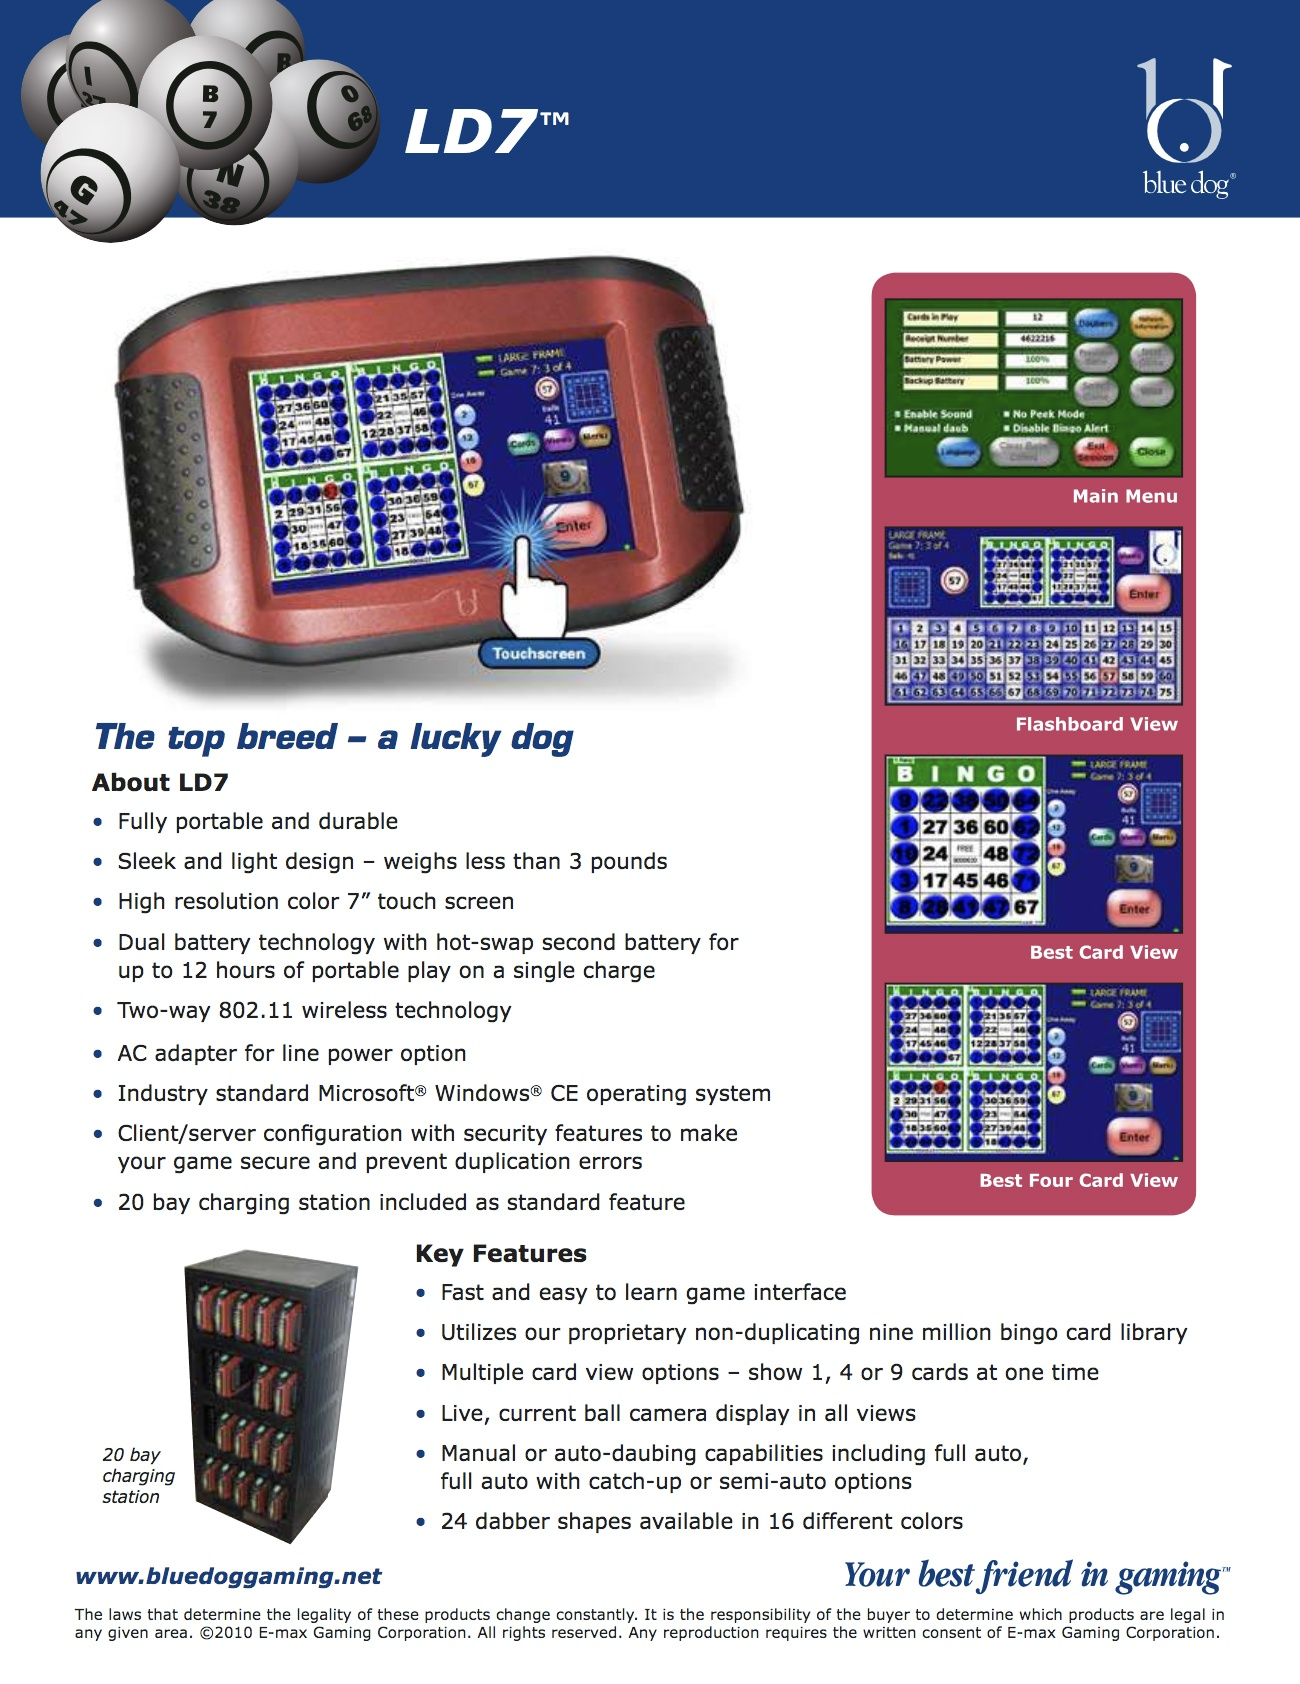 LD7 Flyer Promotional Materials/Equipment Flyers & Brochures